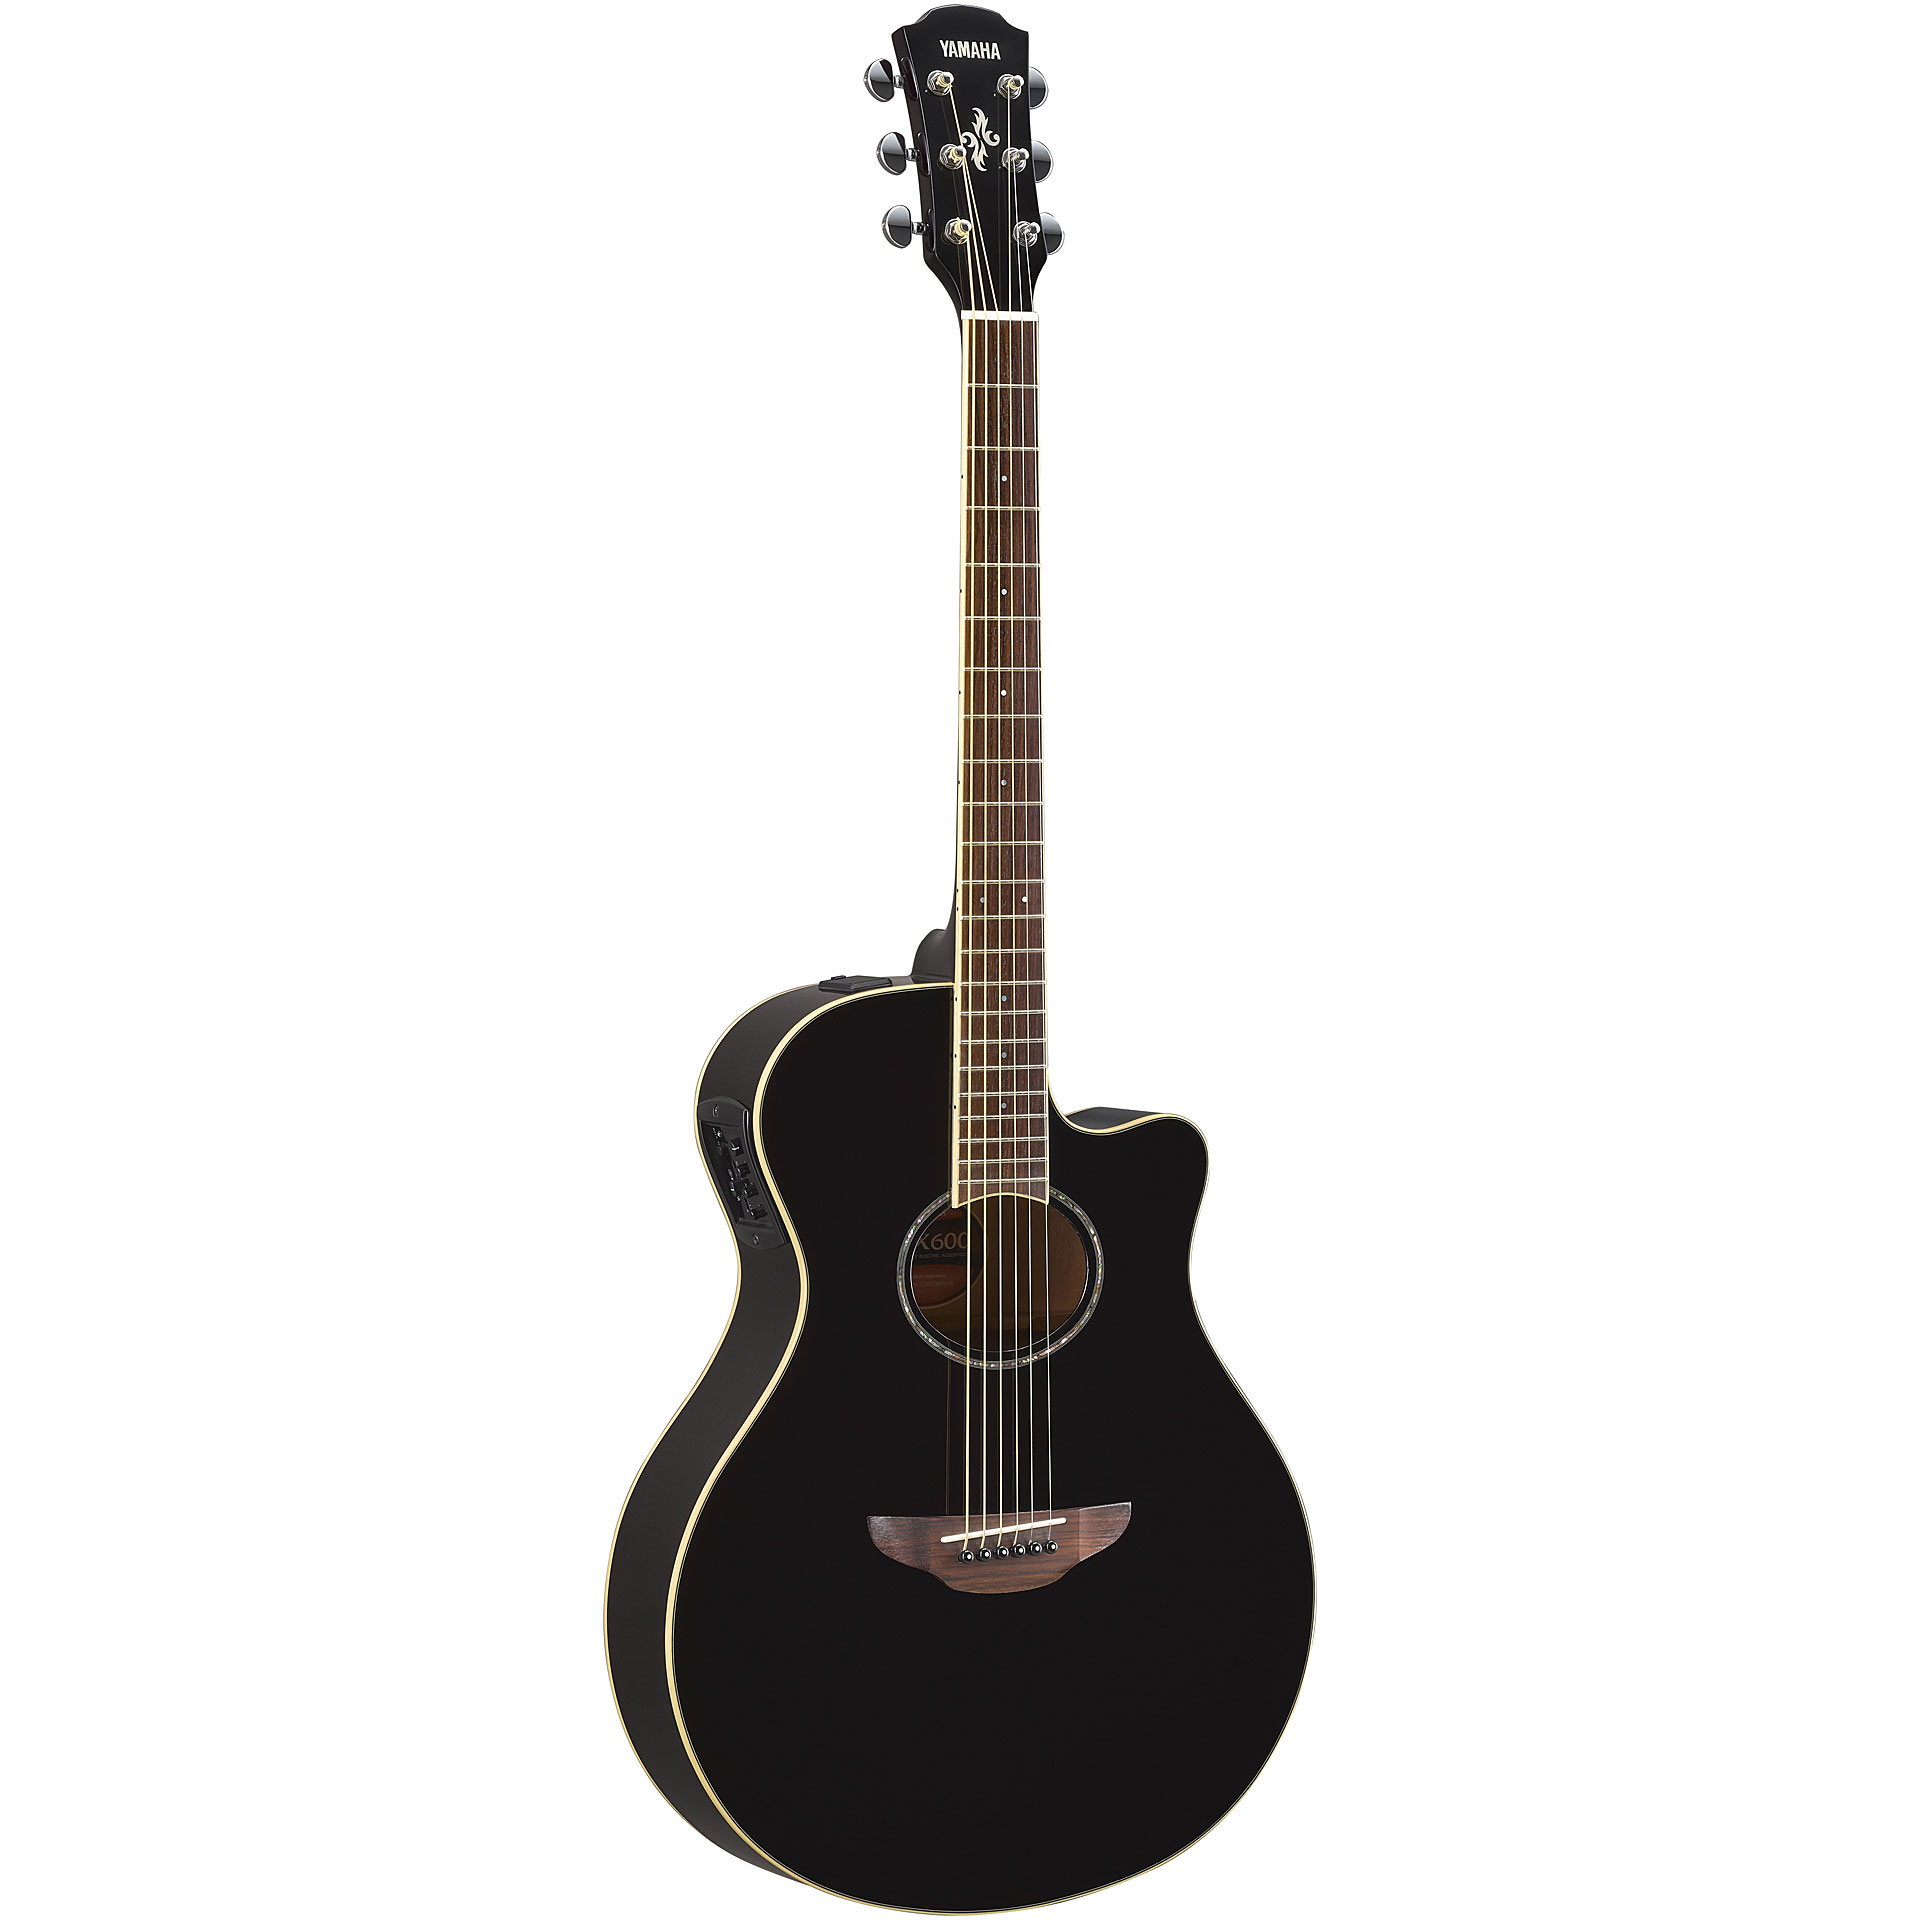 Yamaha Acoustic Guitar Factory